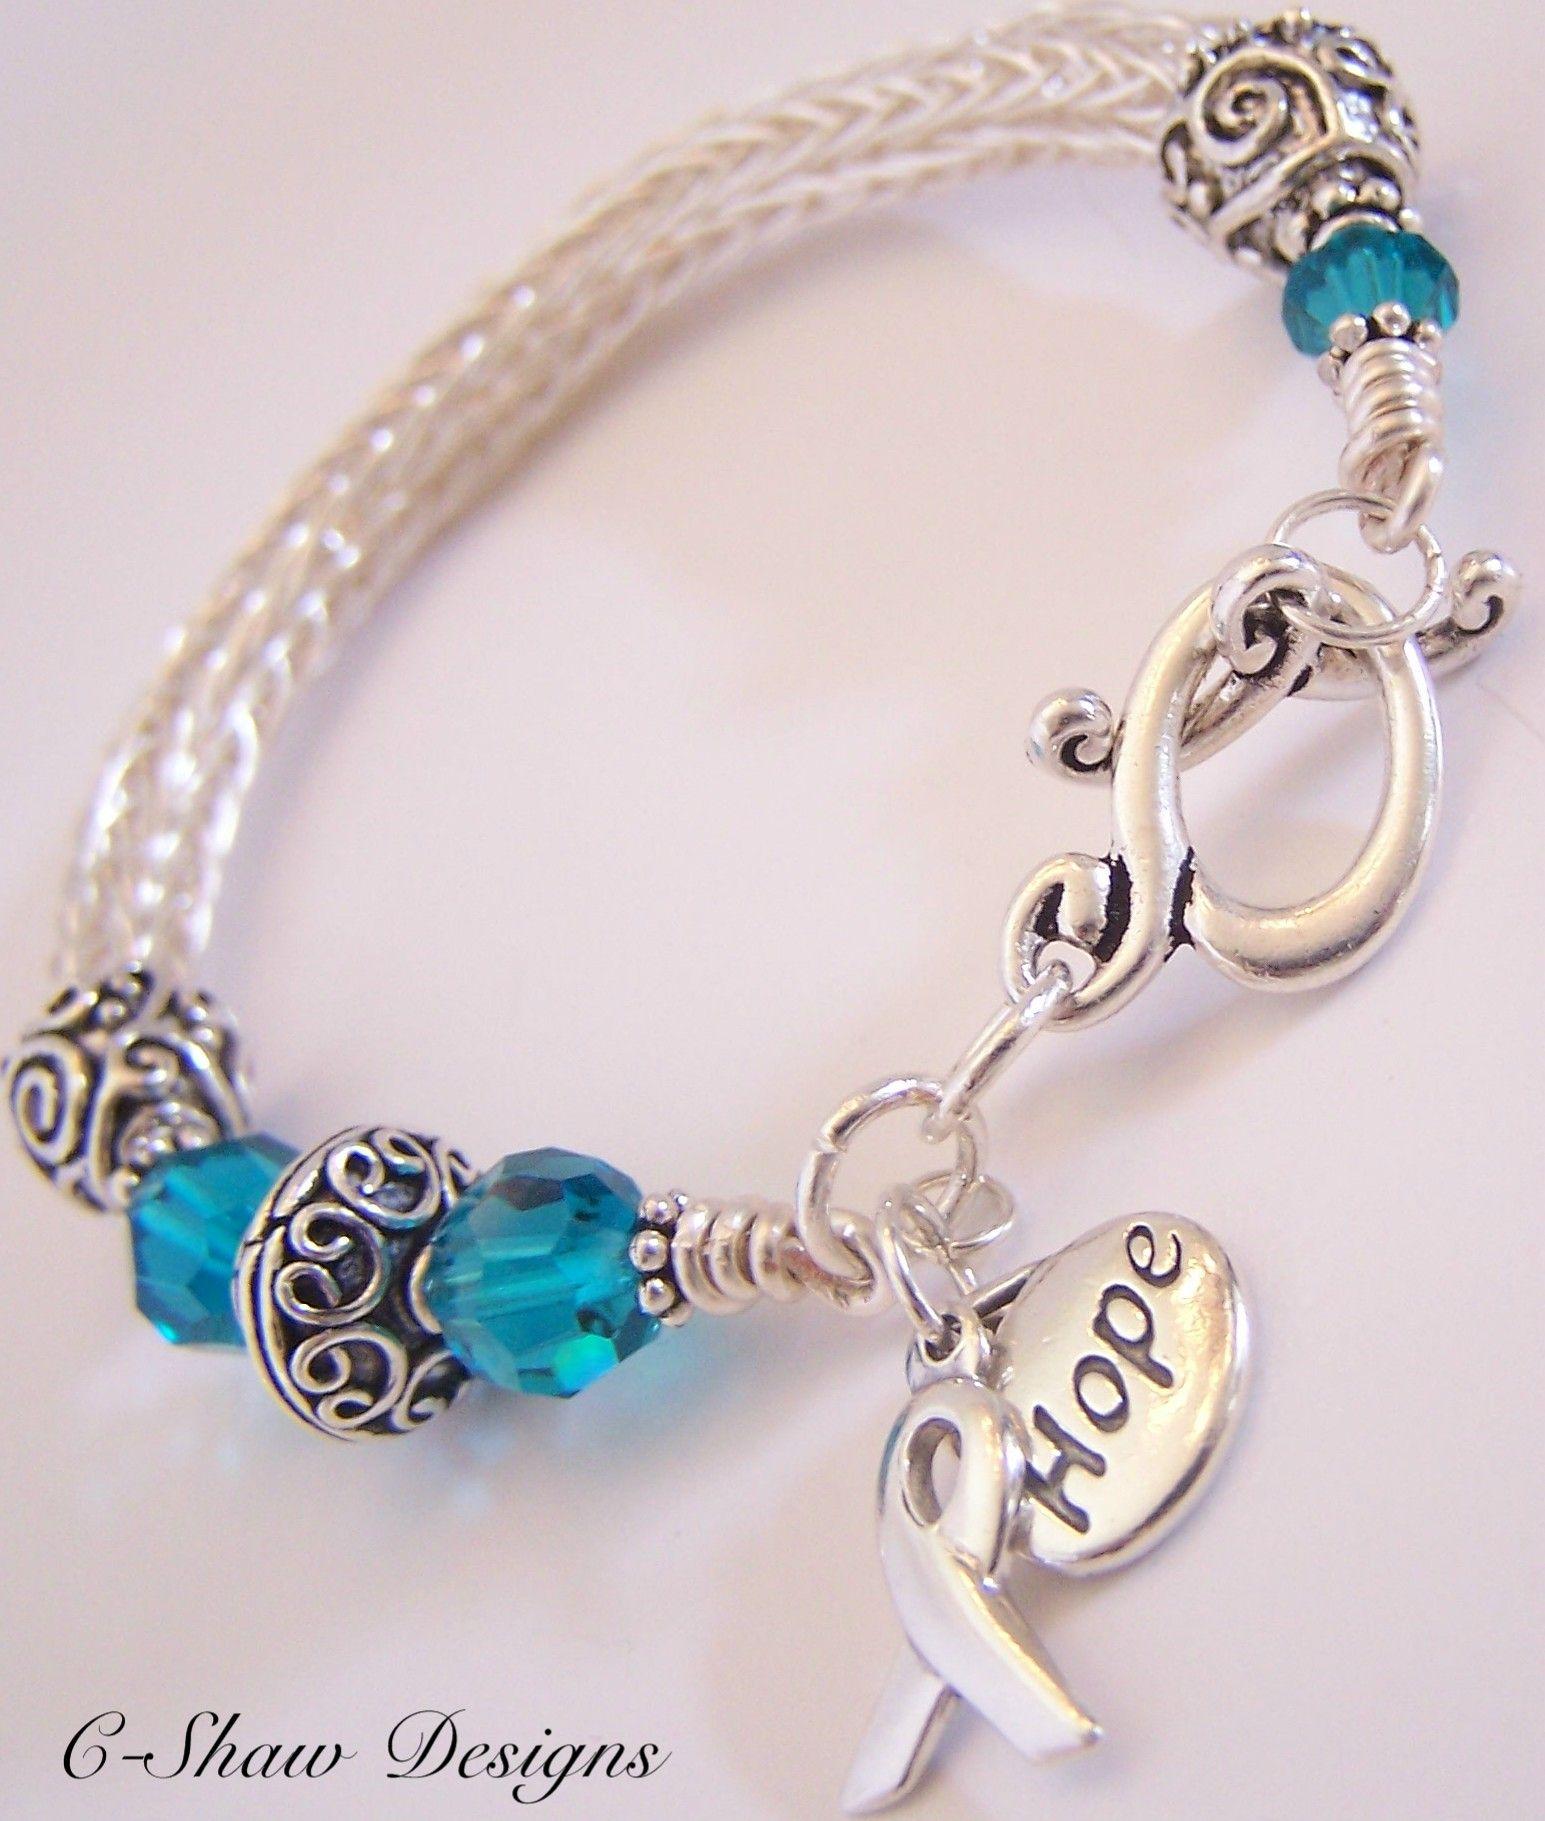 Ovarian Cancer Awareness Bracelet, I am a Survivor!